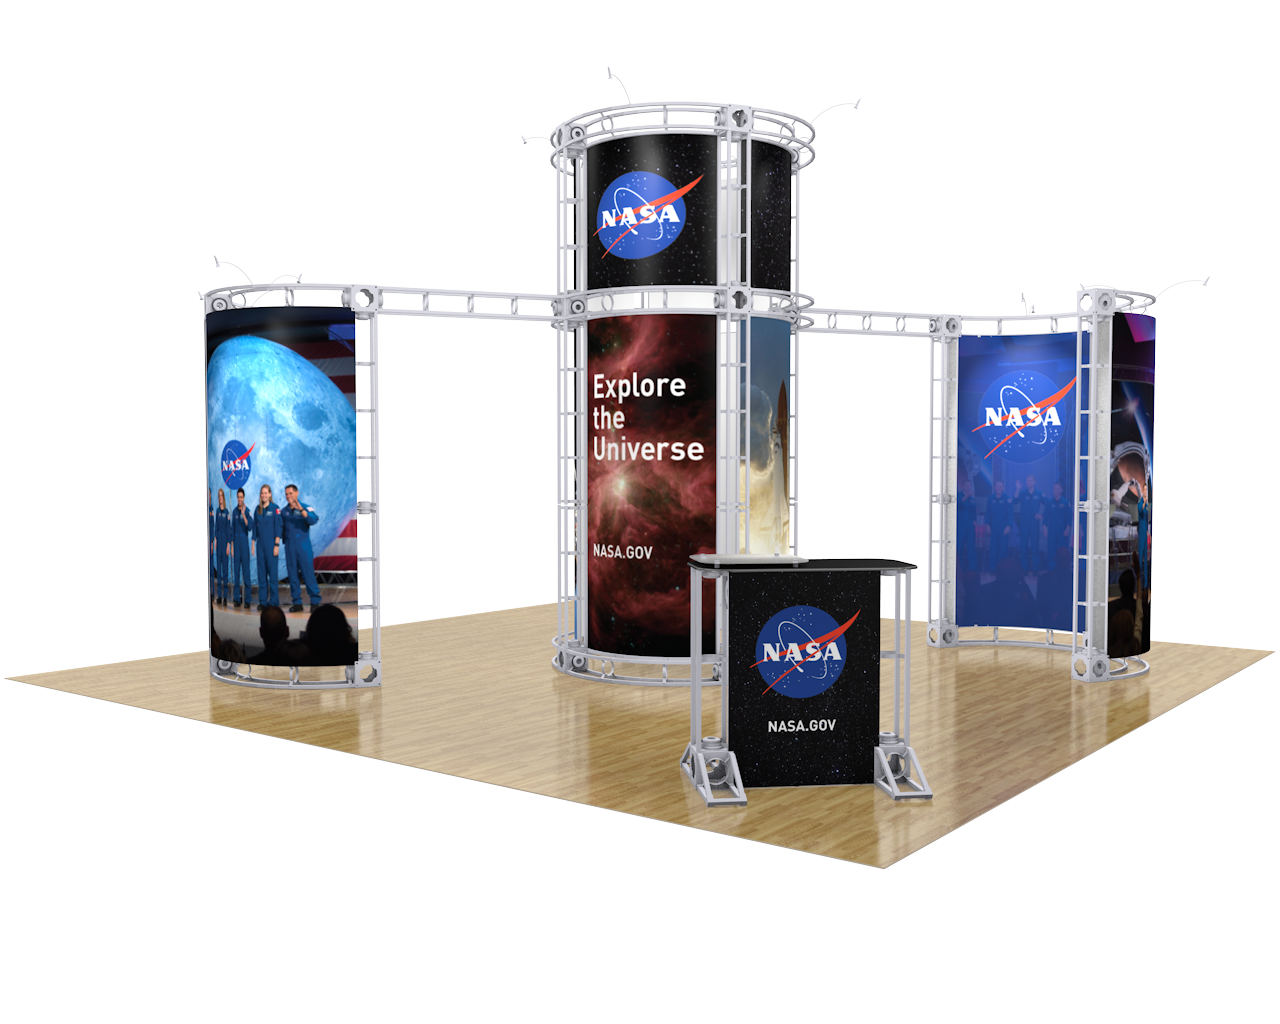 Zenit 20 x 20 Orbital Truss Display